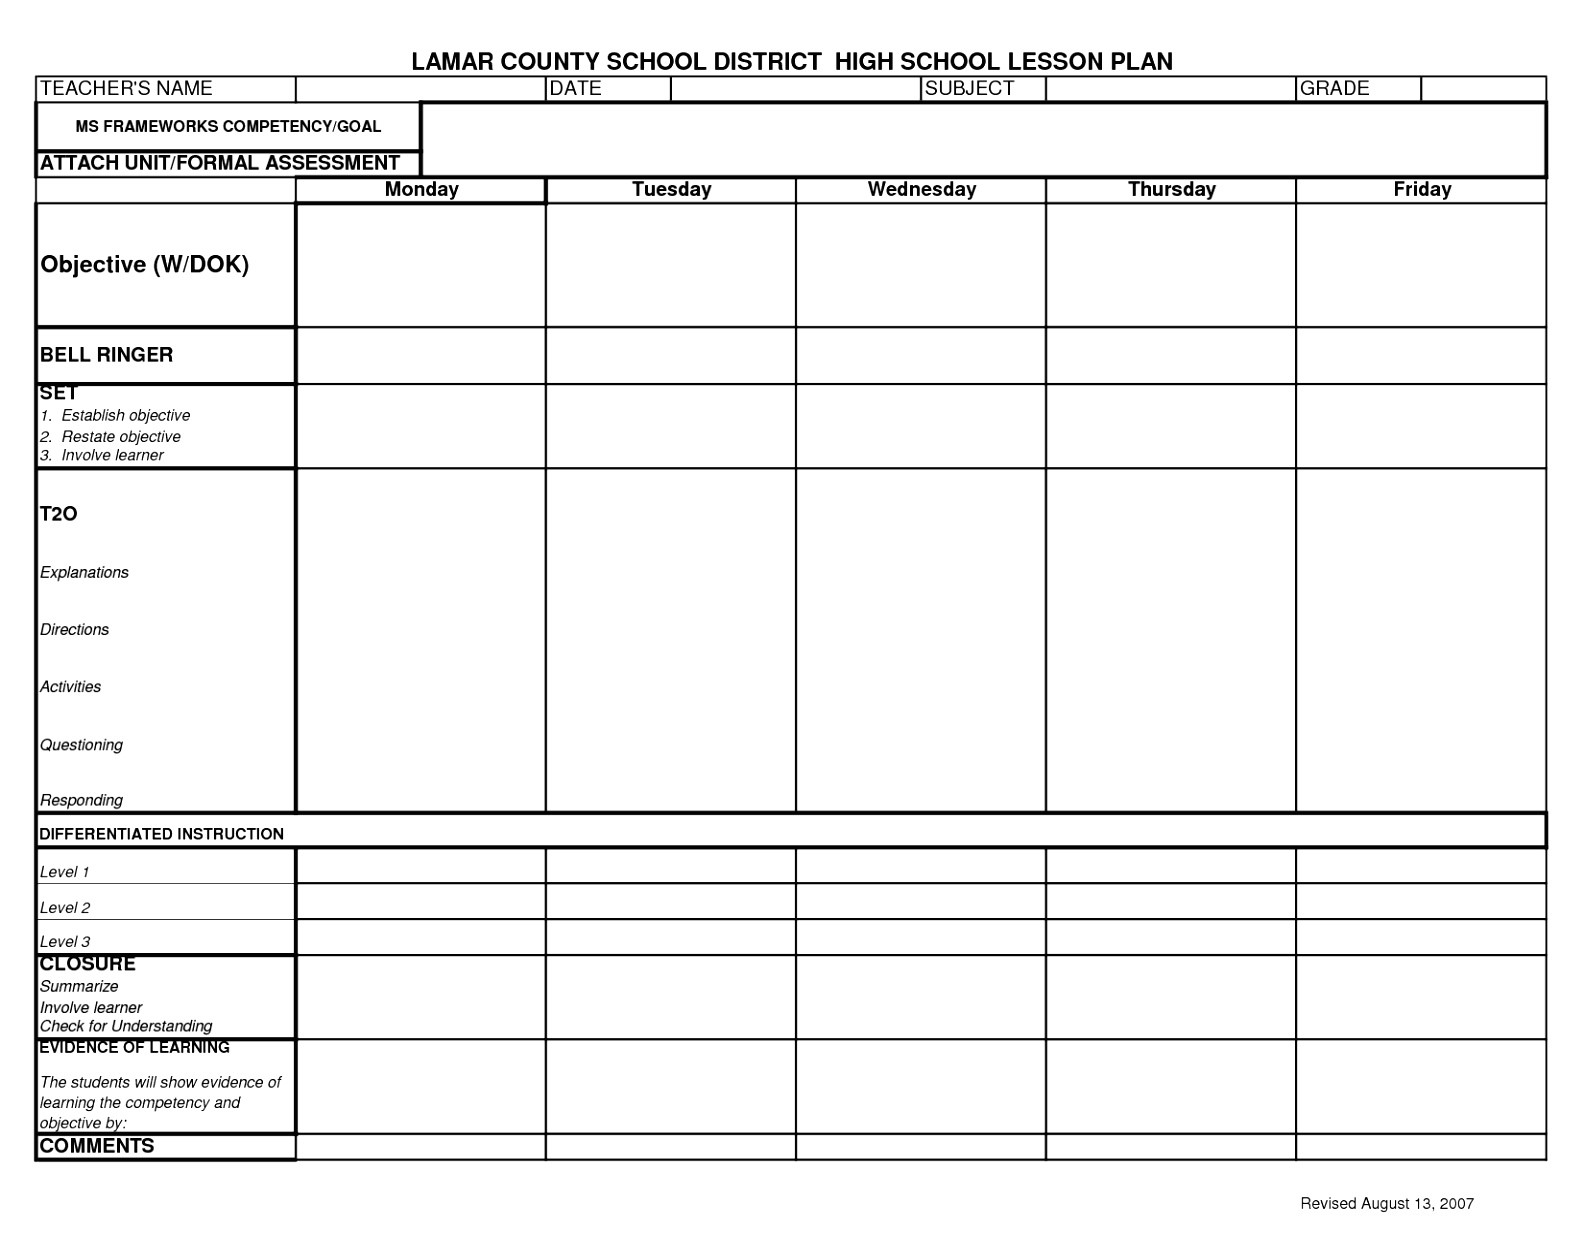 Week Long Lesson Plan Template 6 Week Long Lesson Plan Template Otpey Templatesz234